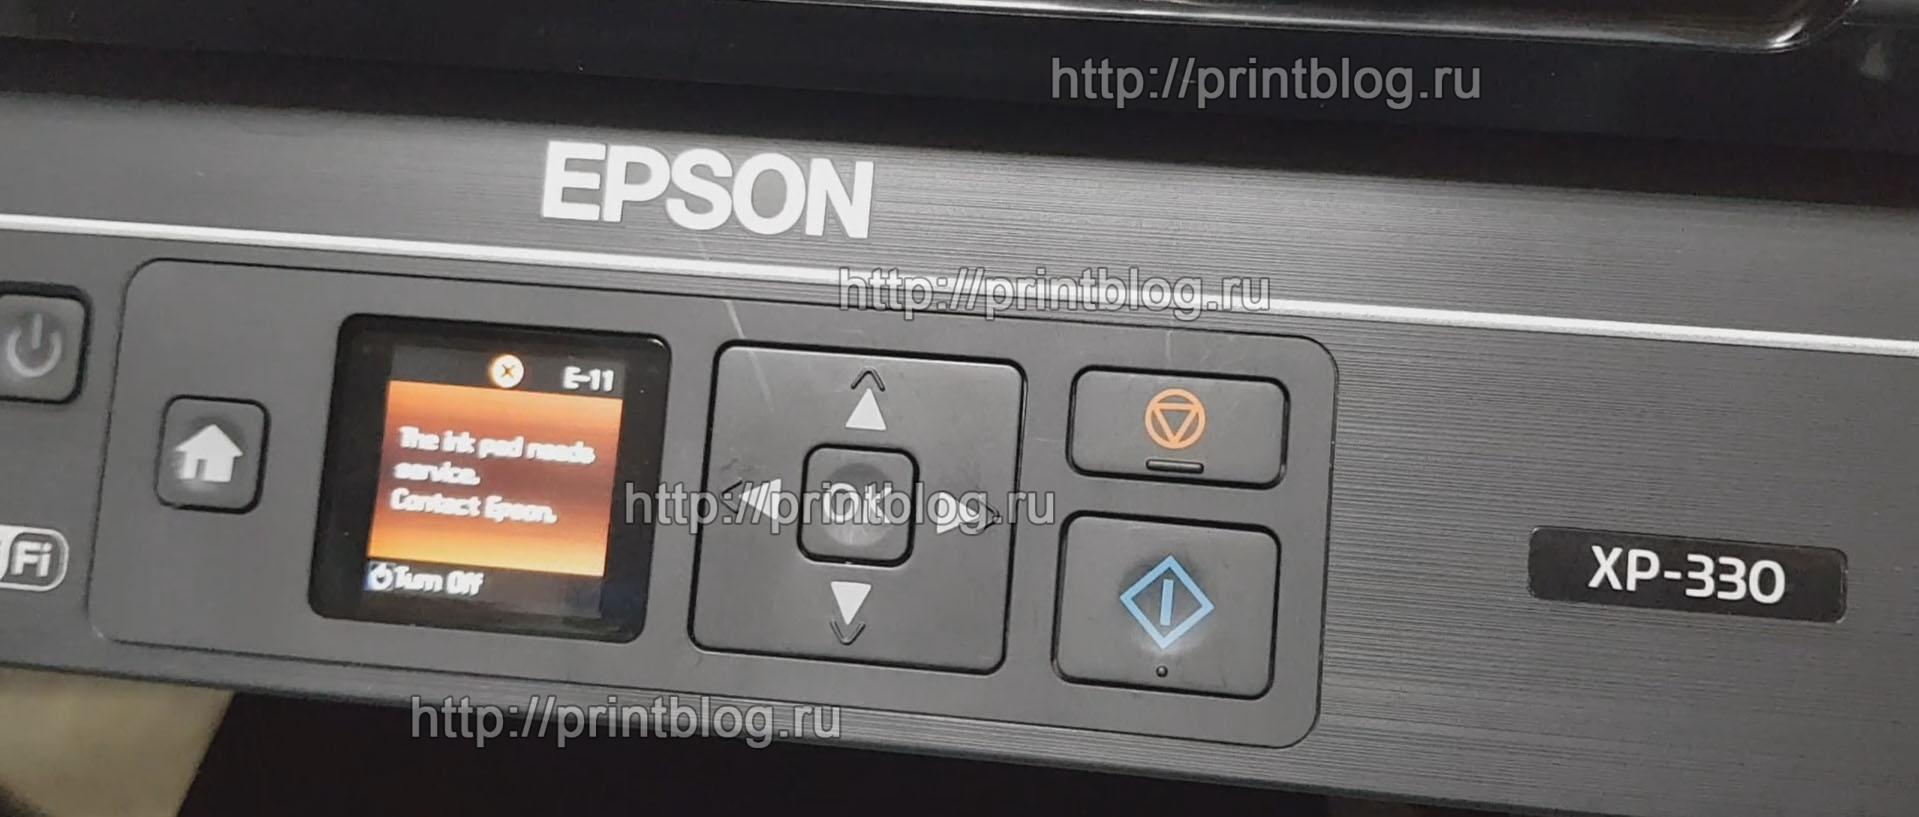 Epson XP-330, XP-430, XP-434 ошибка E-11 (Е-11)